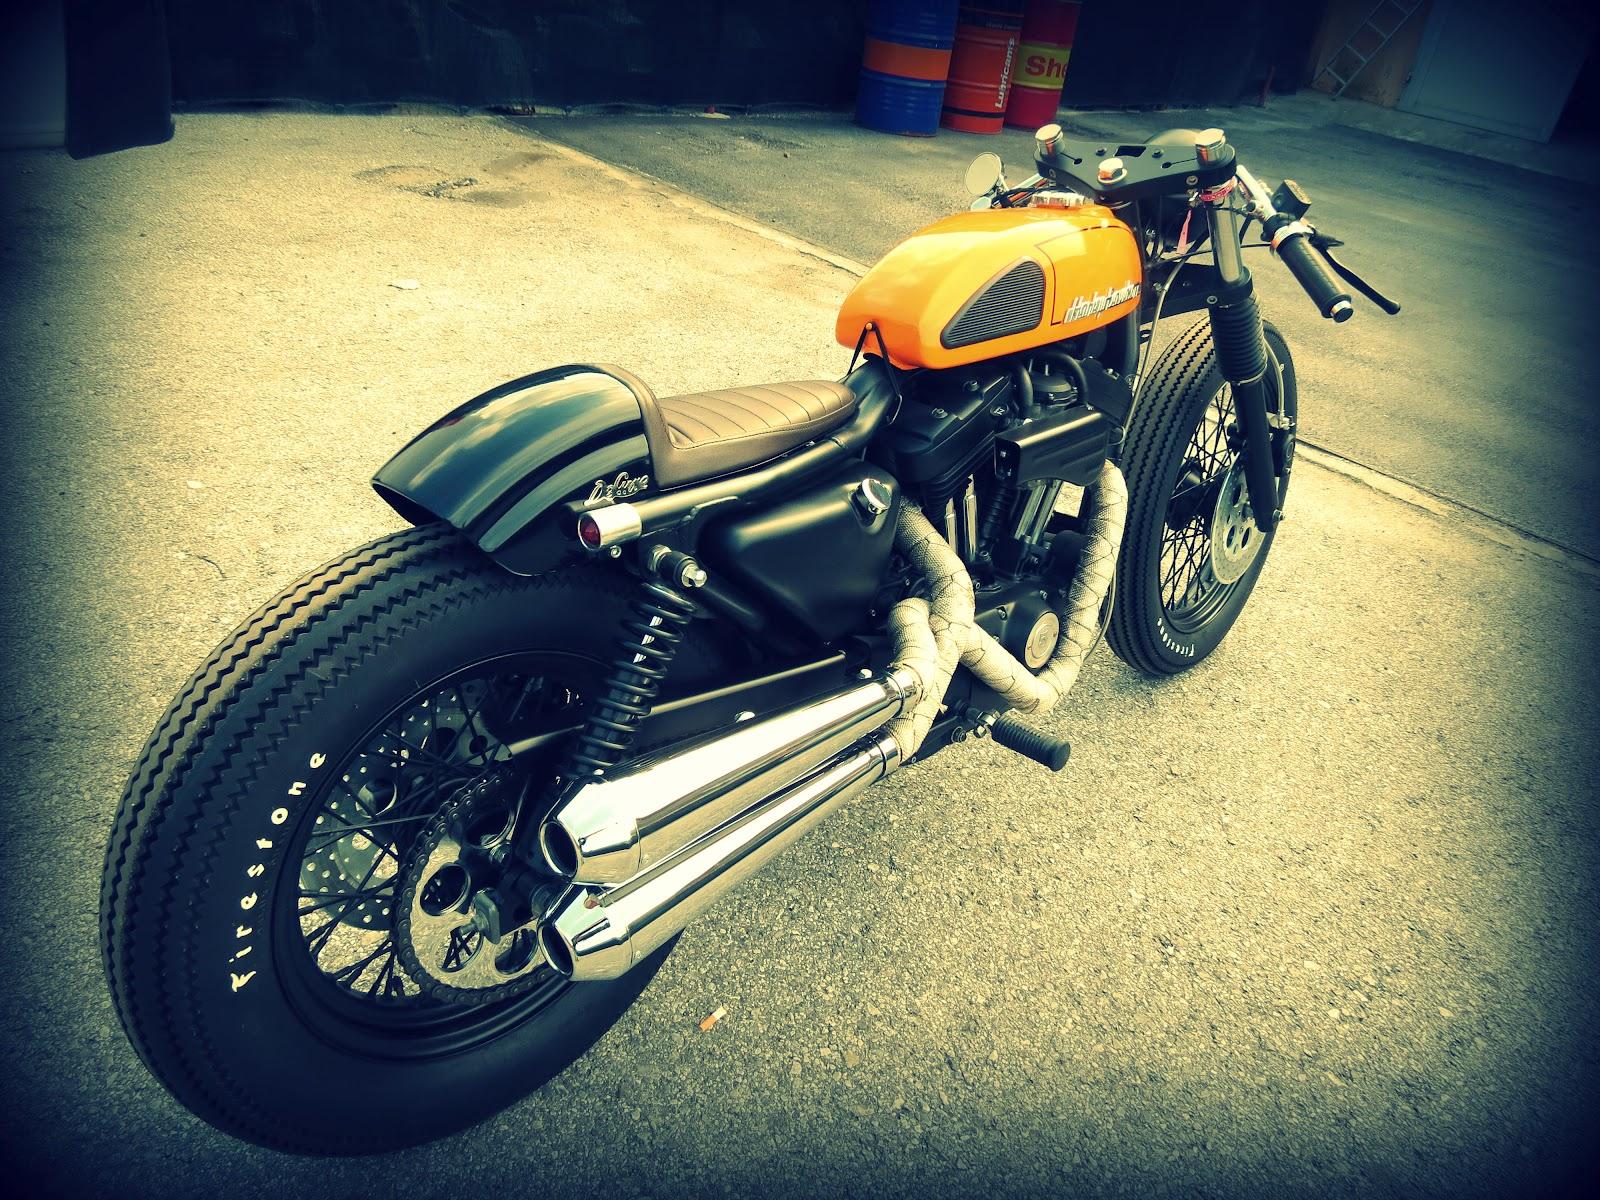 Harley davidson 883 cafe racer wallpaper and background image 1600x1200 id 374505 - Cafe racer background ...